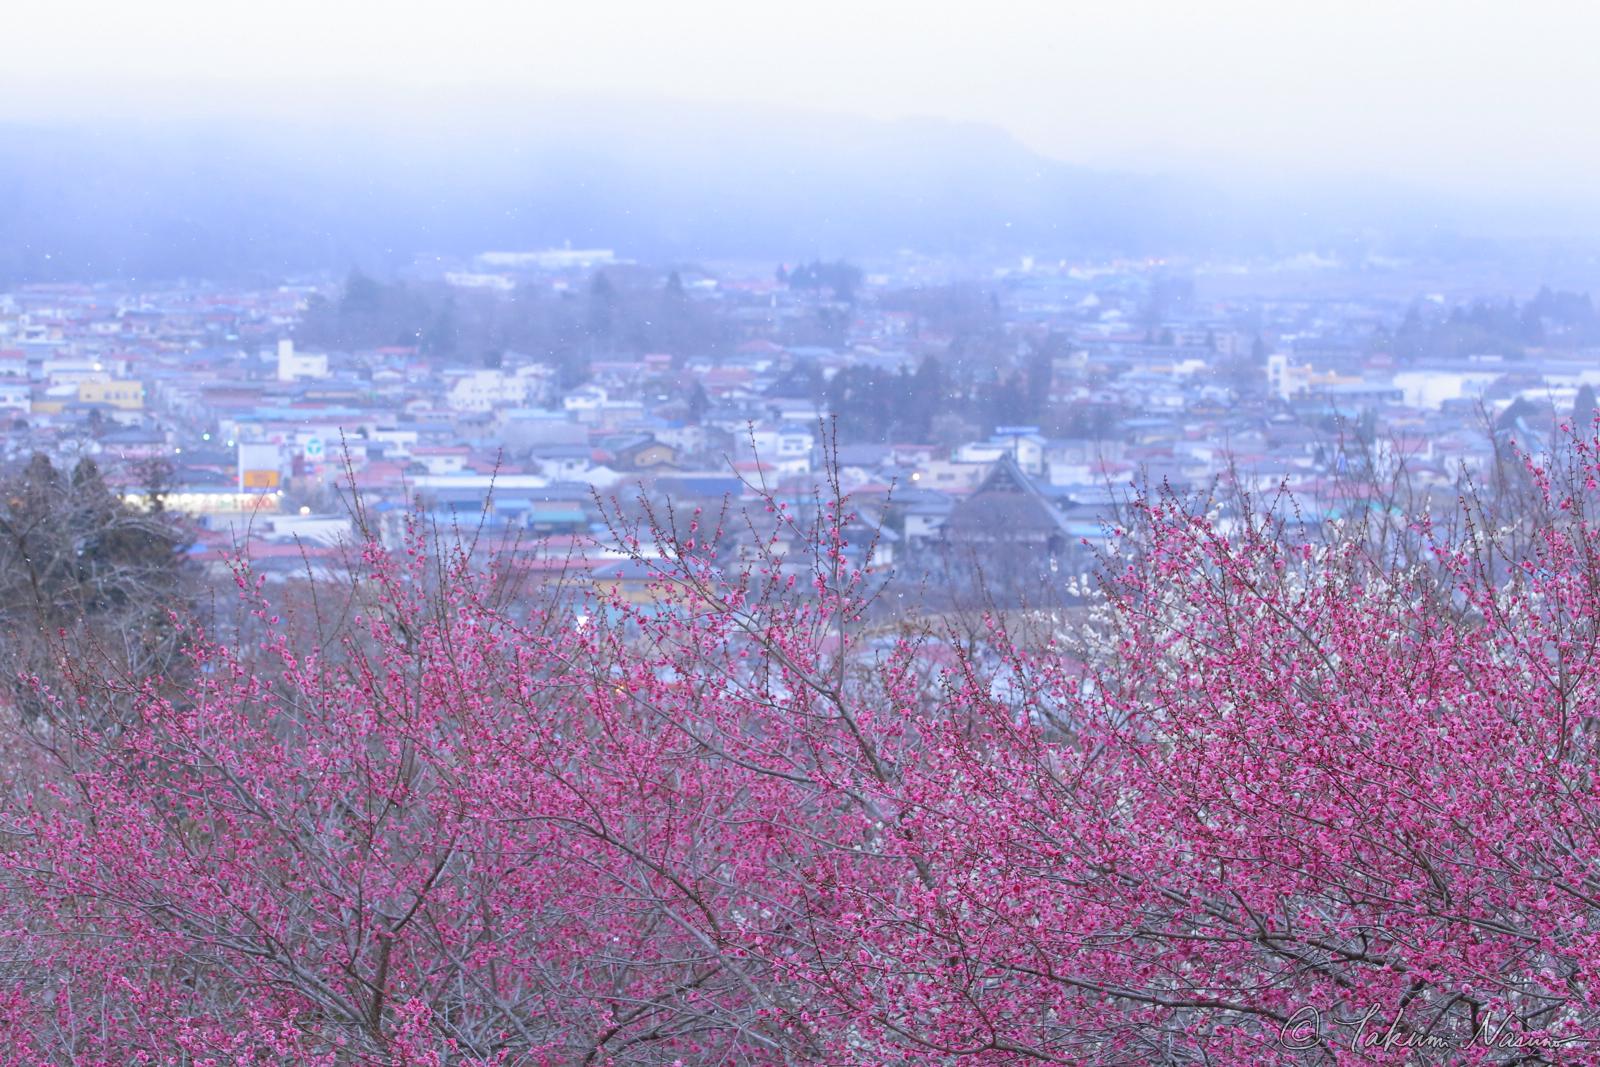 Tanagura Photo Contenst - Snowy Tanagura Town with Ume Blossom's Flavor